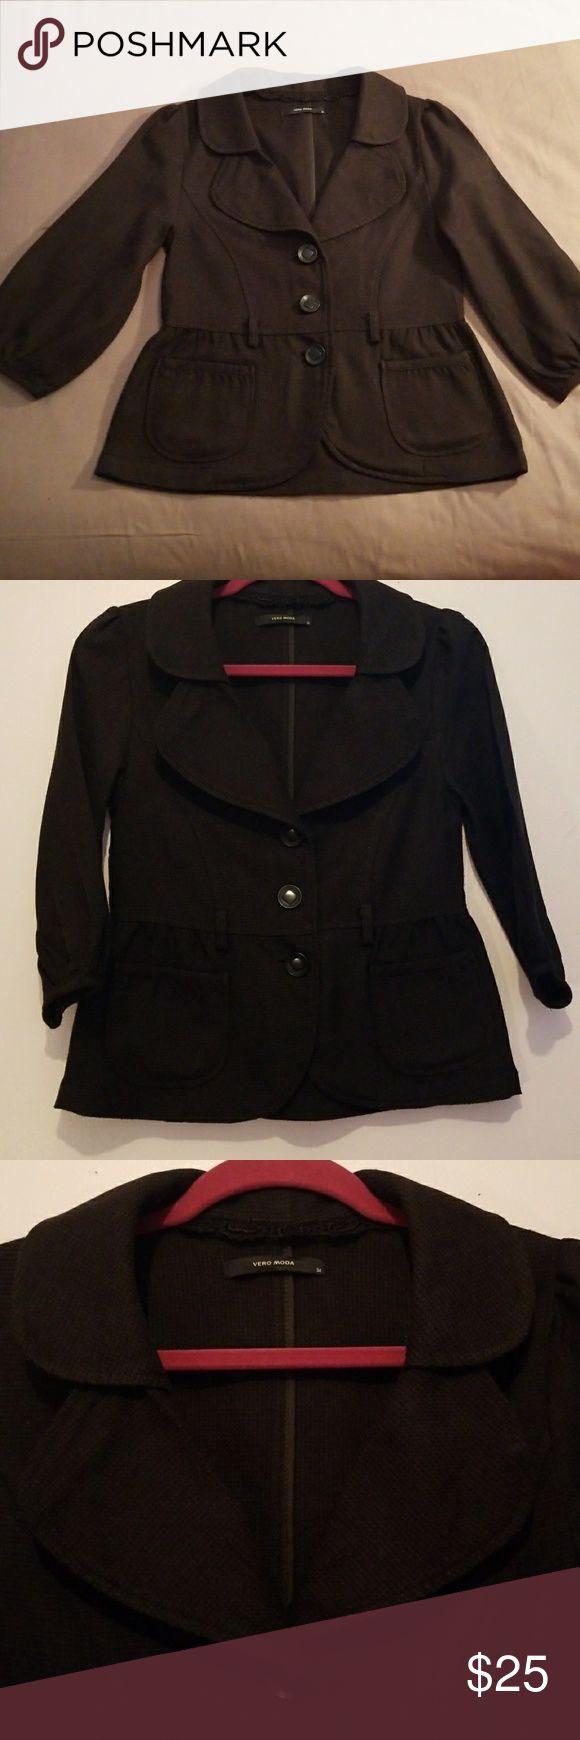 Vero moda blazer jackets Vero mods blazer jackets excellent conditions  lightly used color black size 34  3/4 sleeve super cute great with jeans Vero Moda Jackets & Coats Blazers